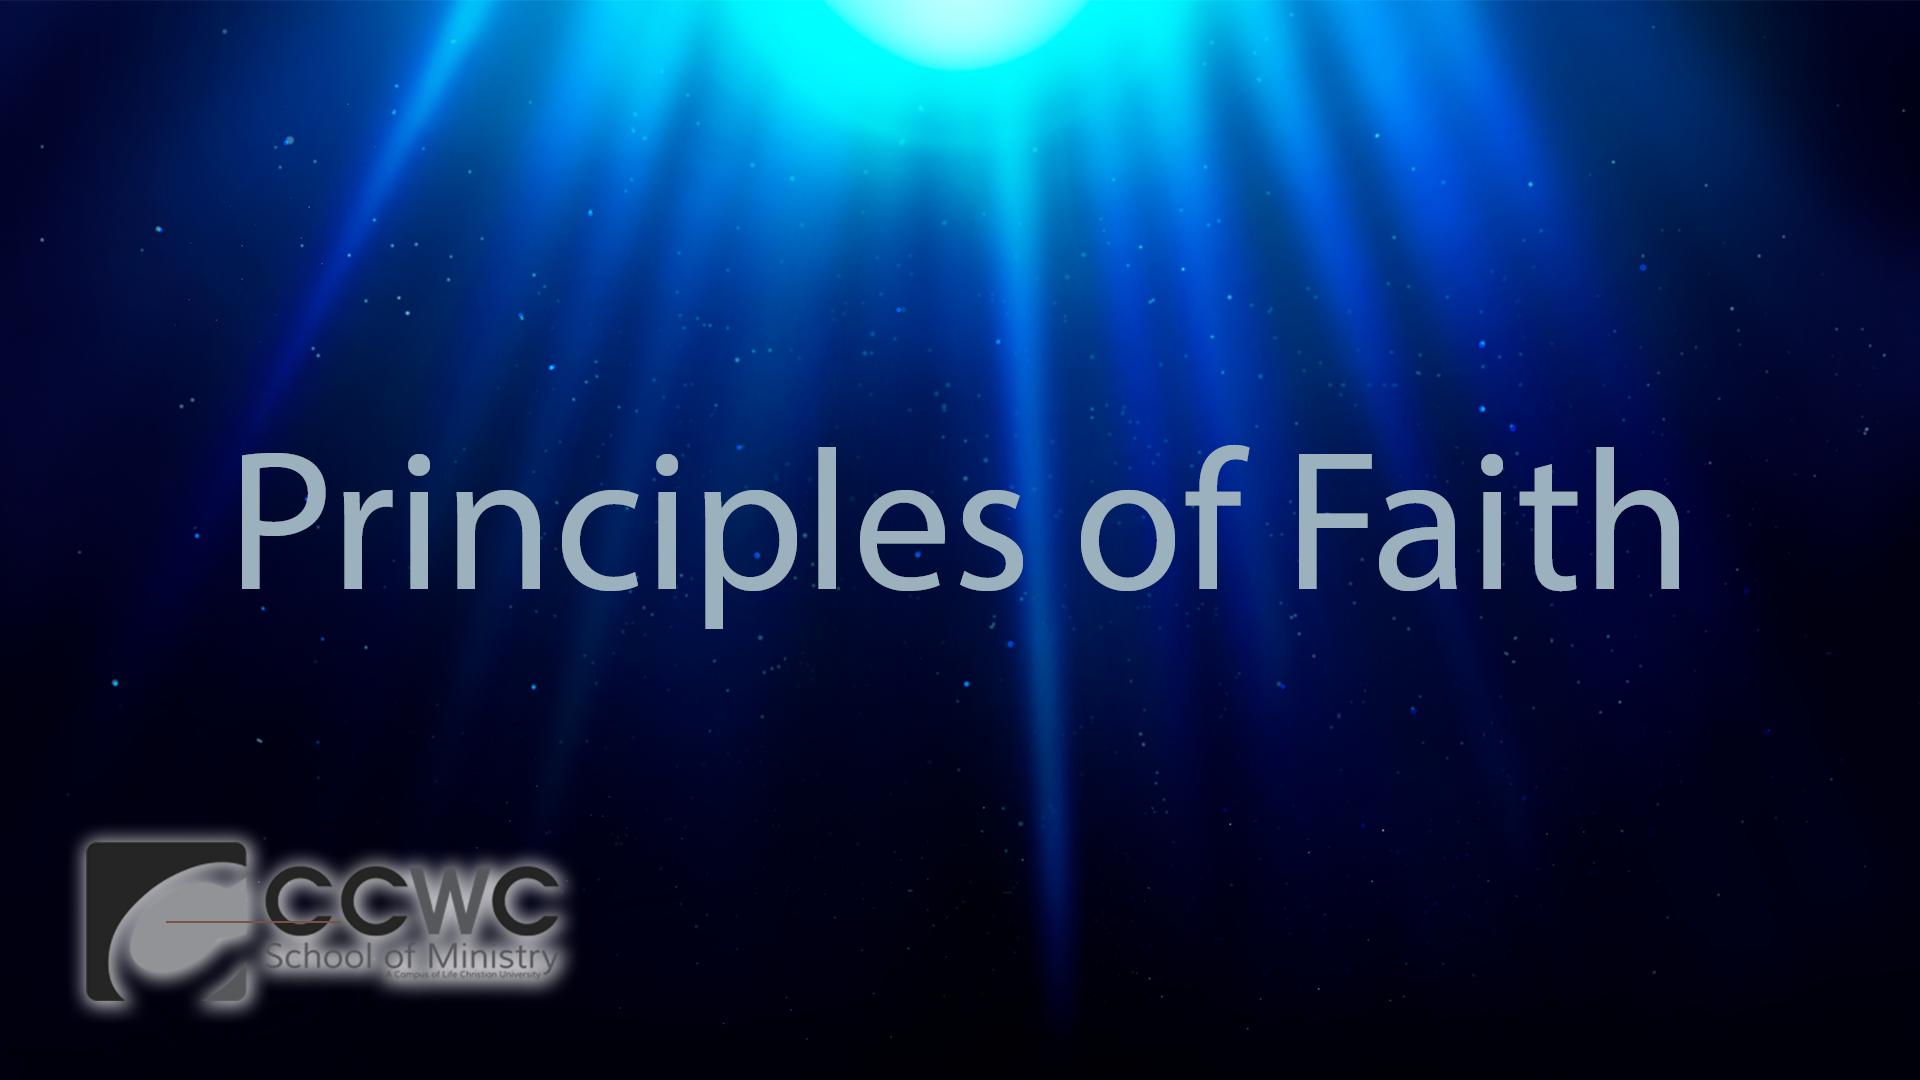 Life Christian University – Principles of Faith